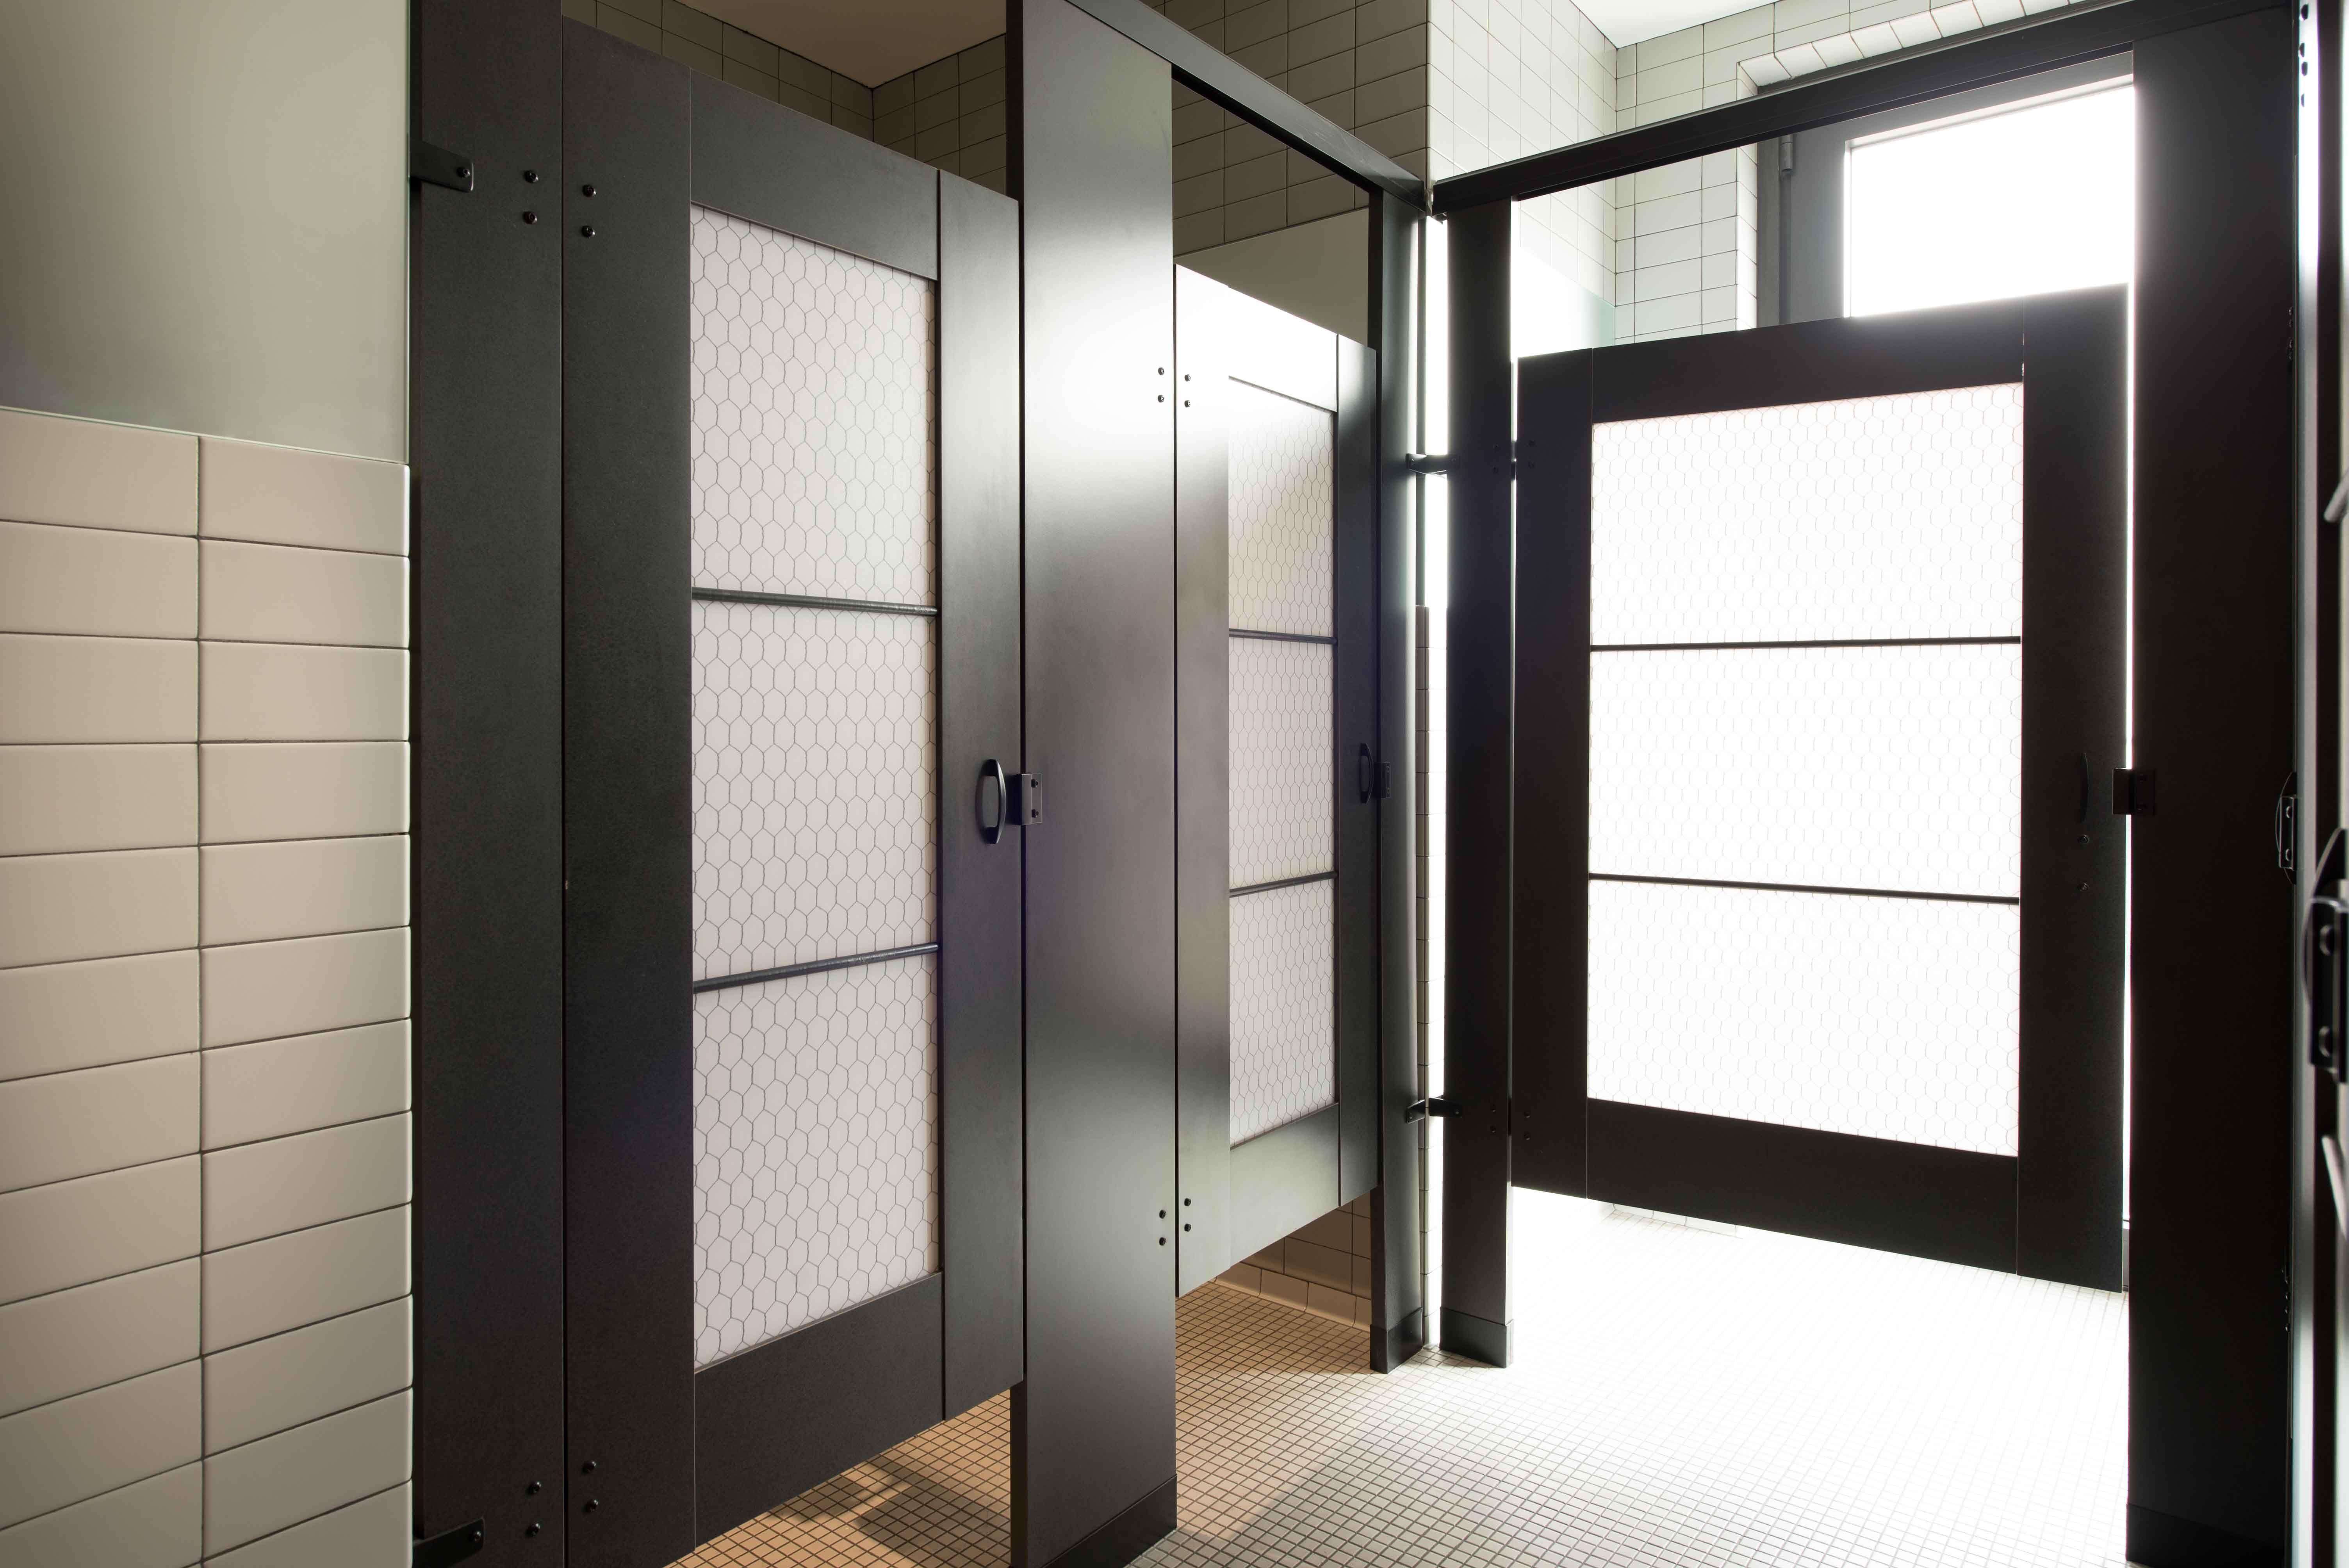 Ironwood Manufacturing laminate toilet partitions with engraved bathroom door. Unique custom public restrooms. & Ironwood Manufacturing laminate toilet partitions with engraved ...